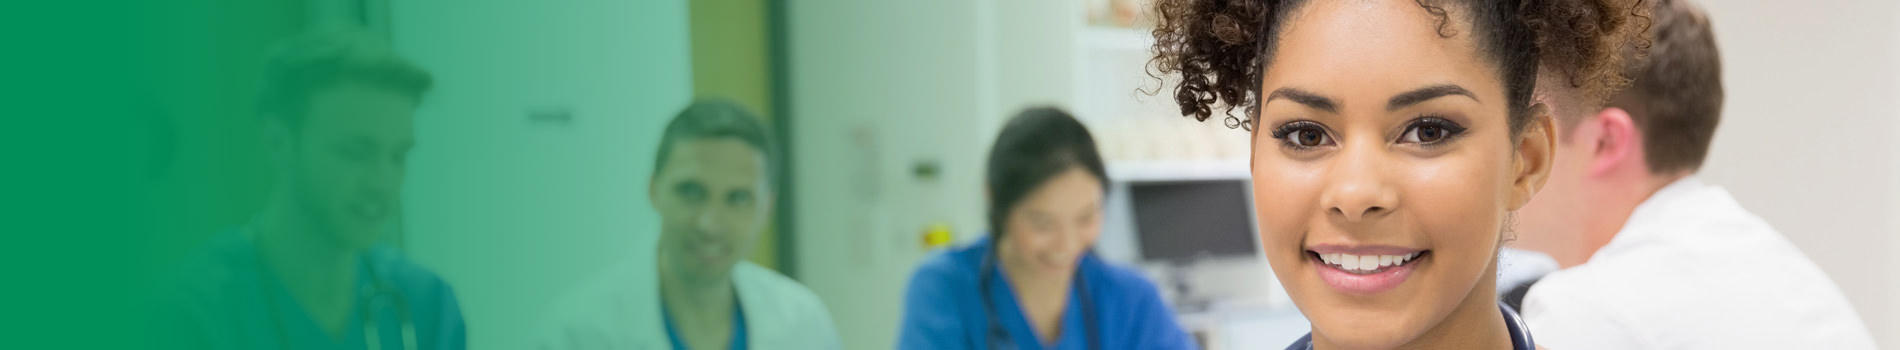 Doctors Mortgages Online Doctors